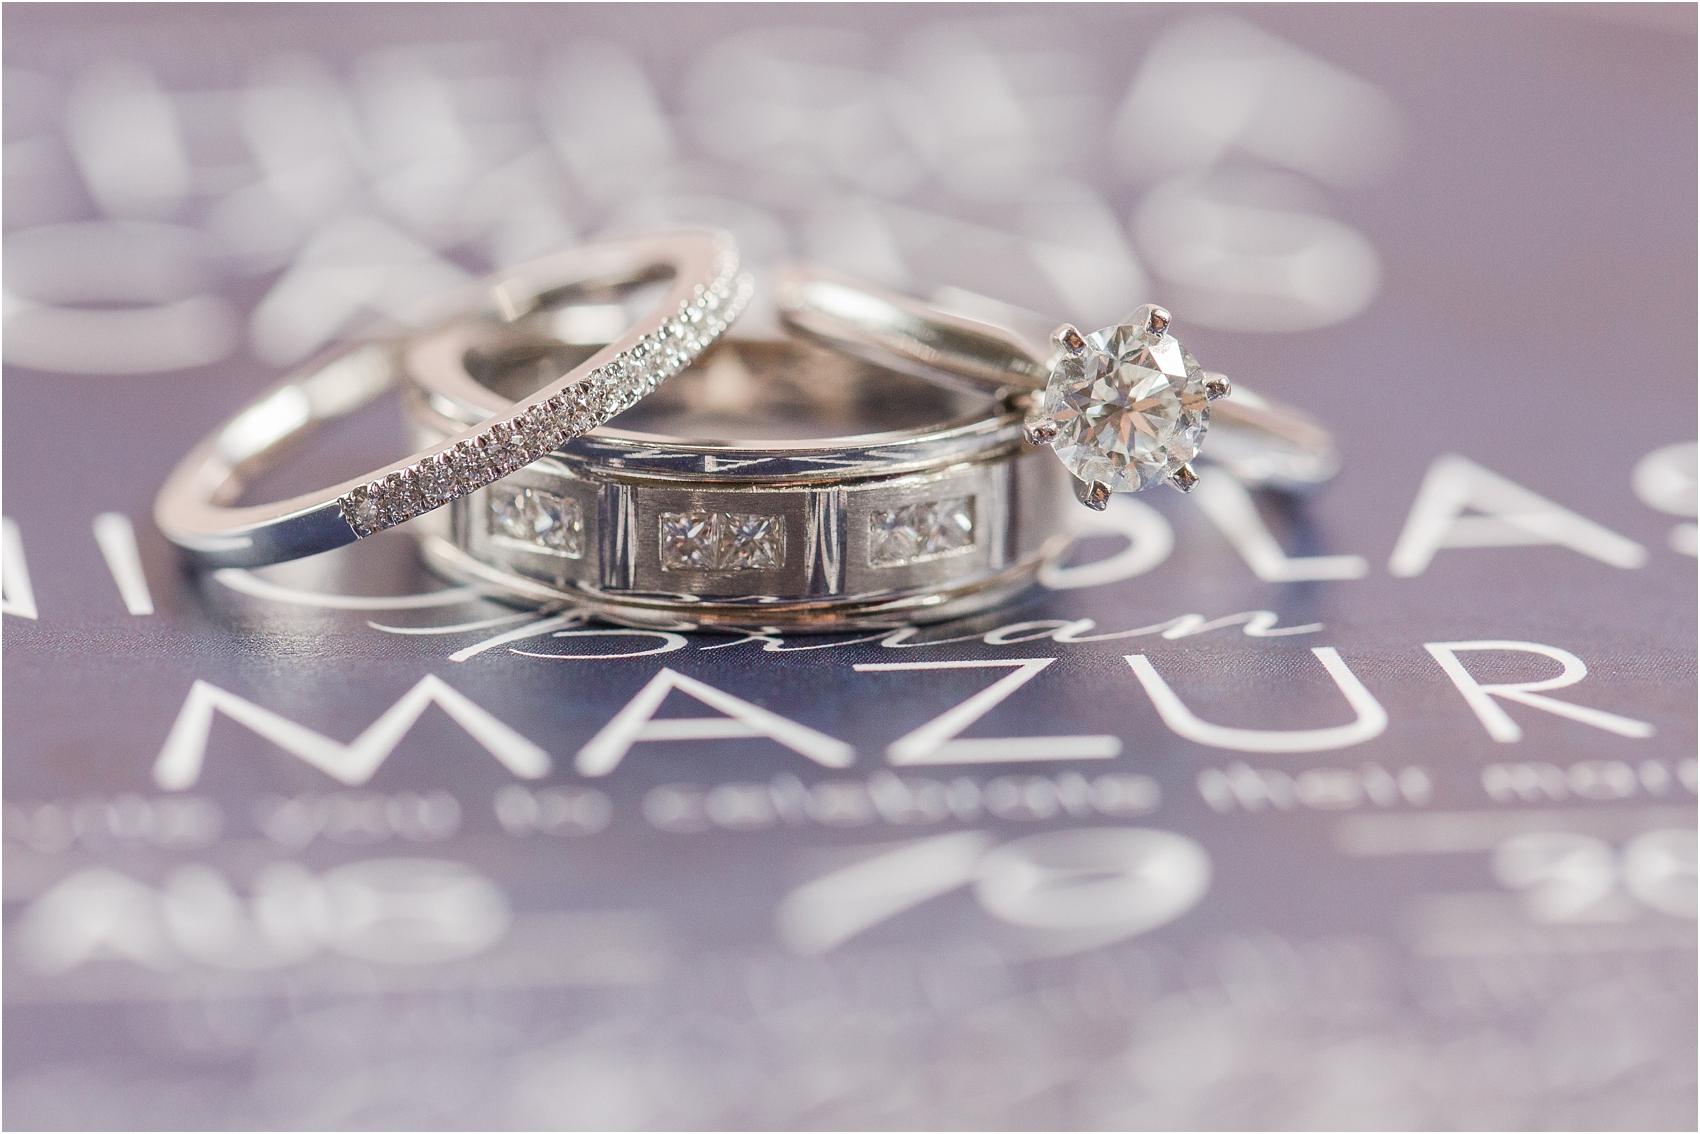 joyful-and-candid-navy-blush-wedding-photos-at-crystal-gardens-in-howell-mi-by-courtney-carolyn-photography_0028.jpg